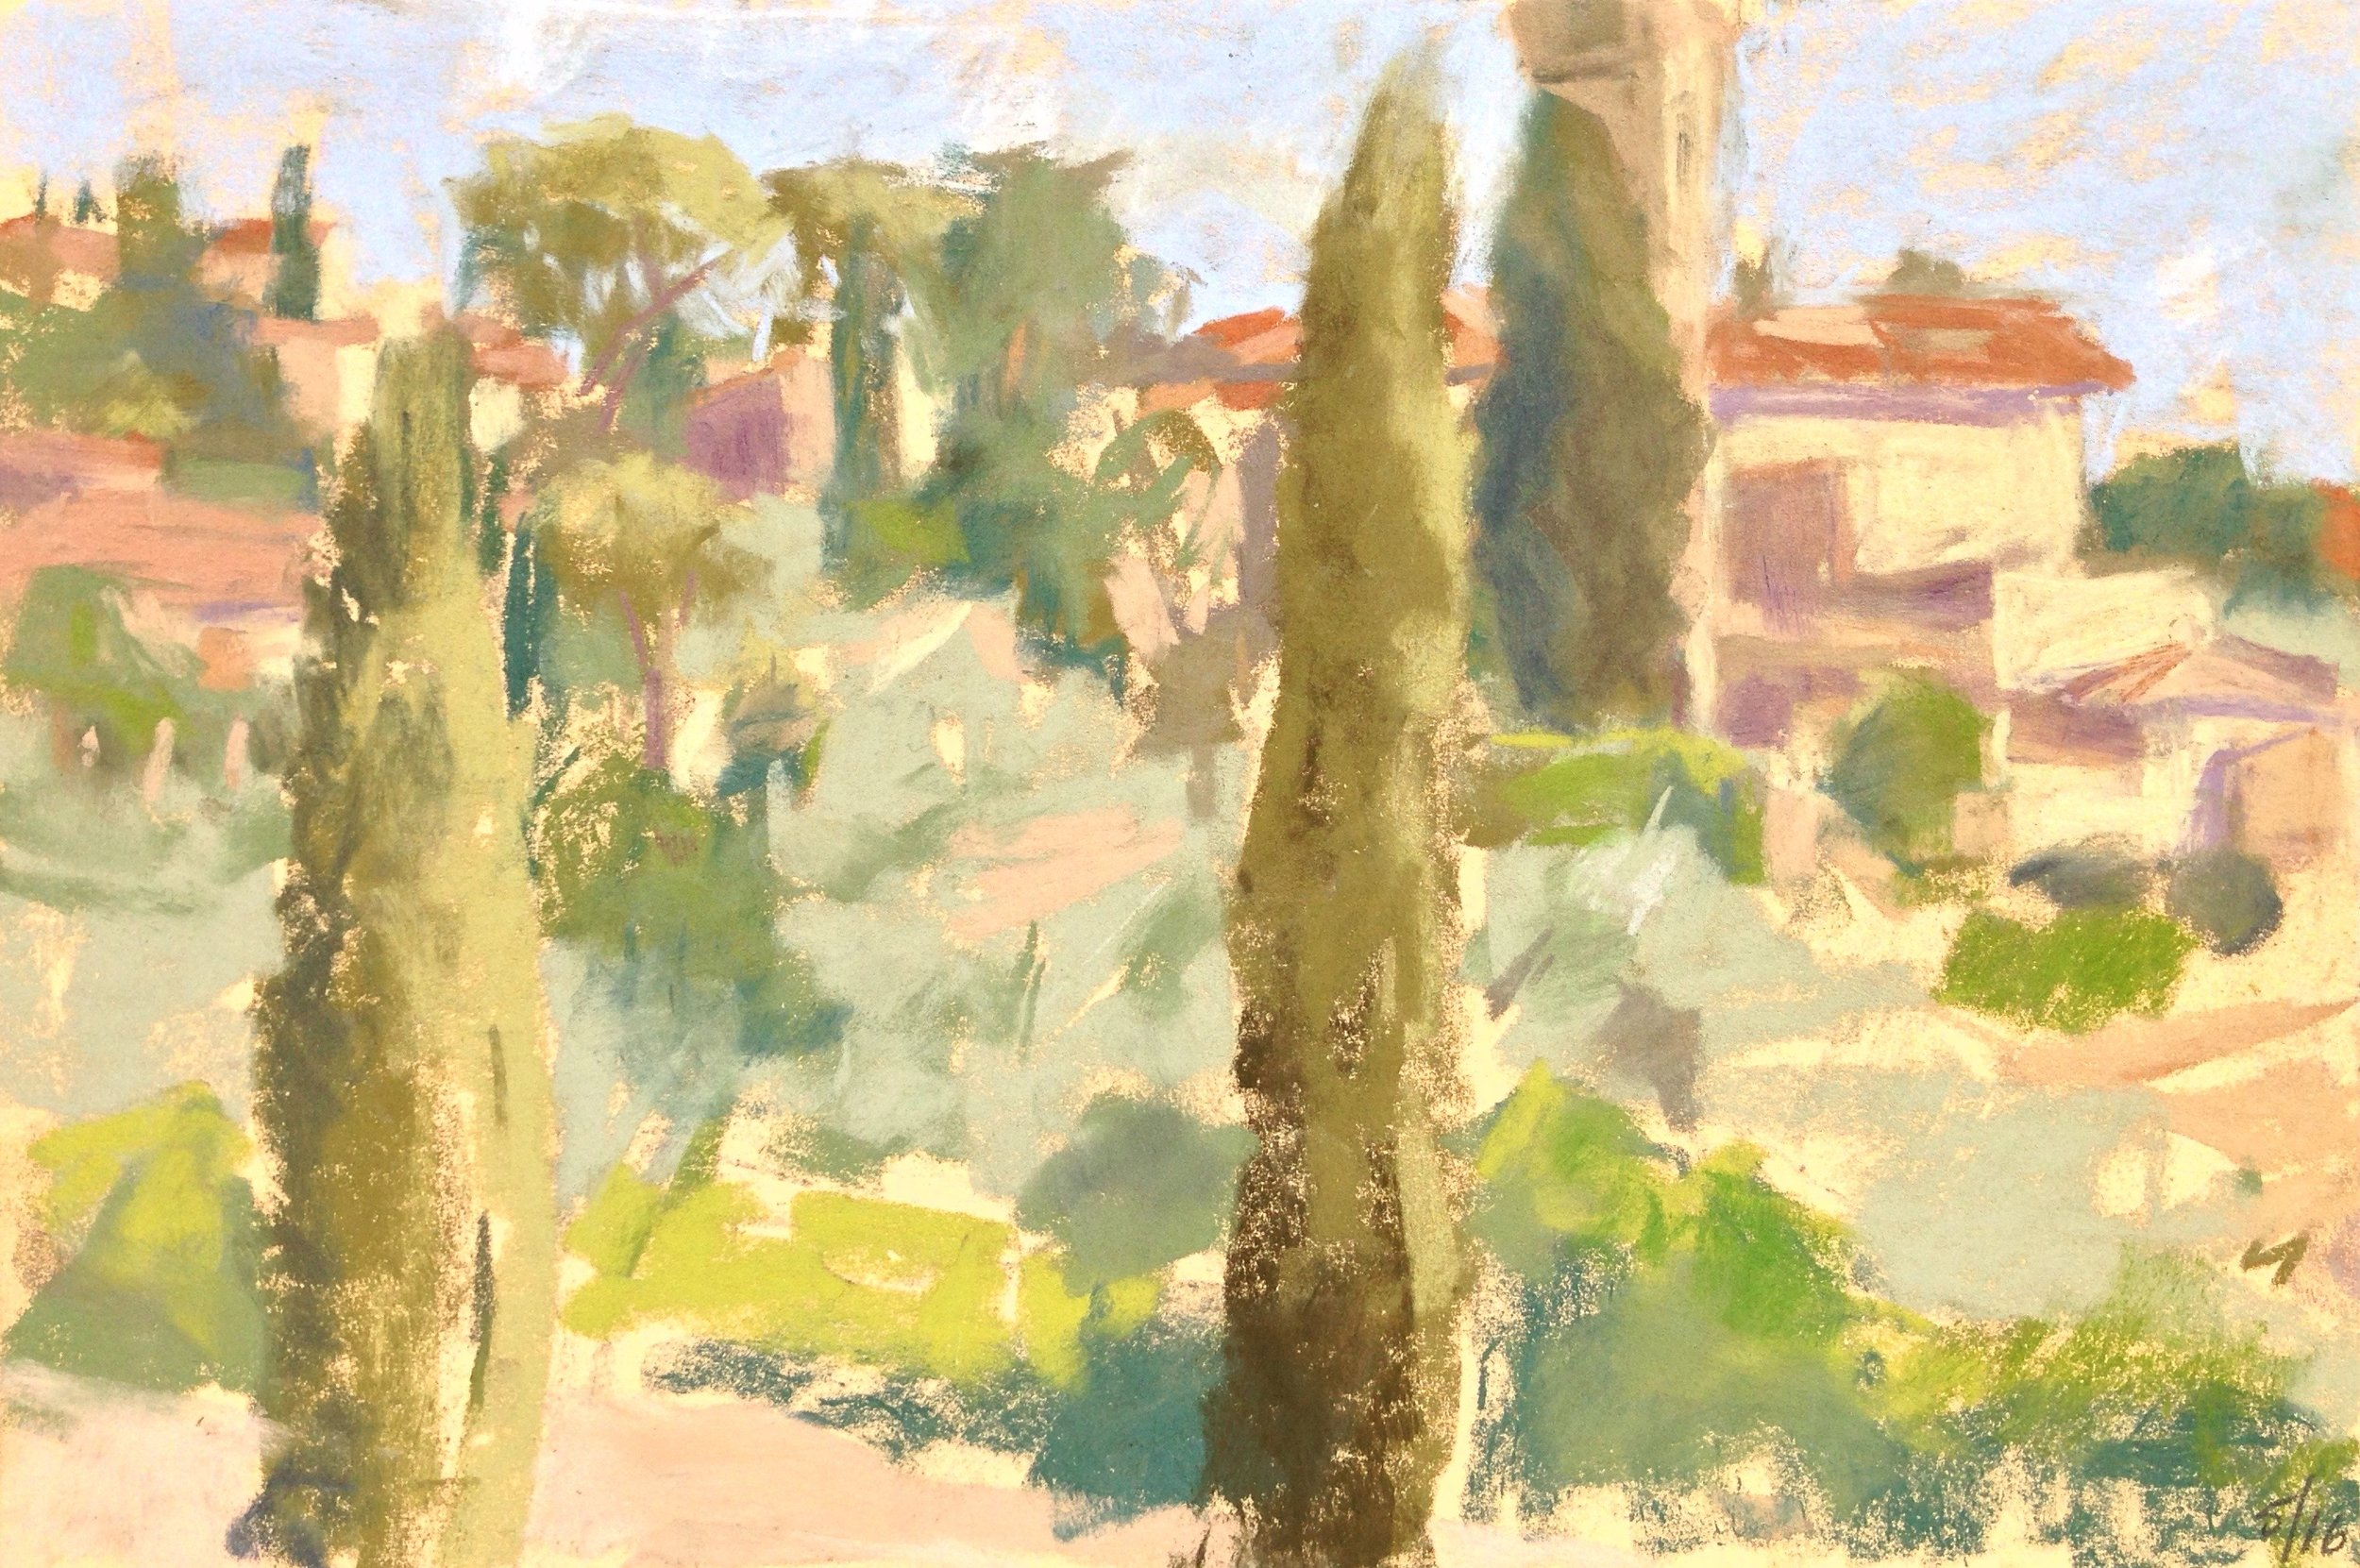 Settignano Hillside, May 16